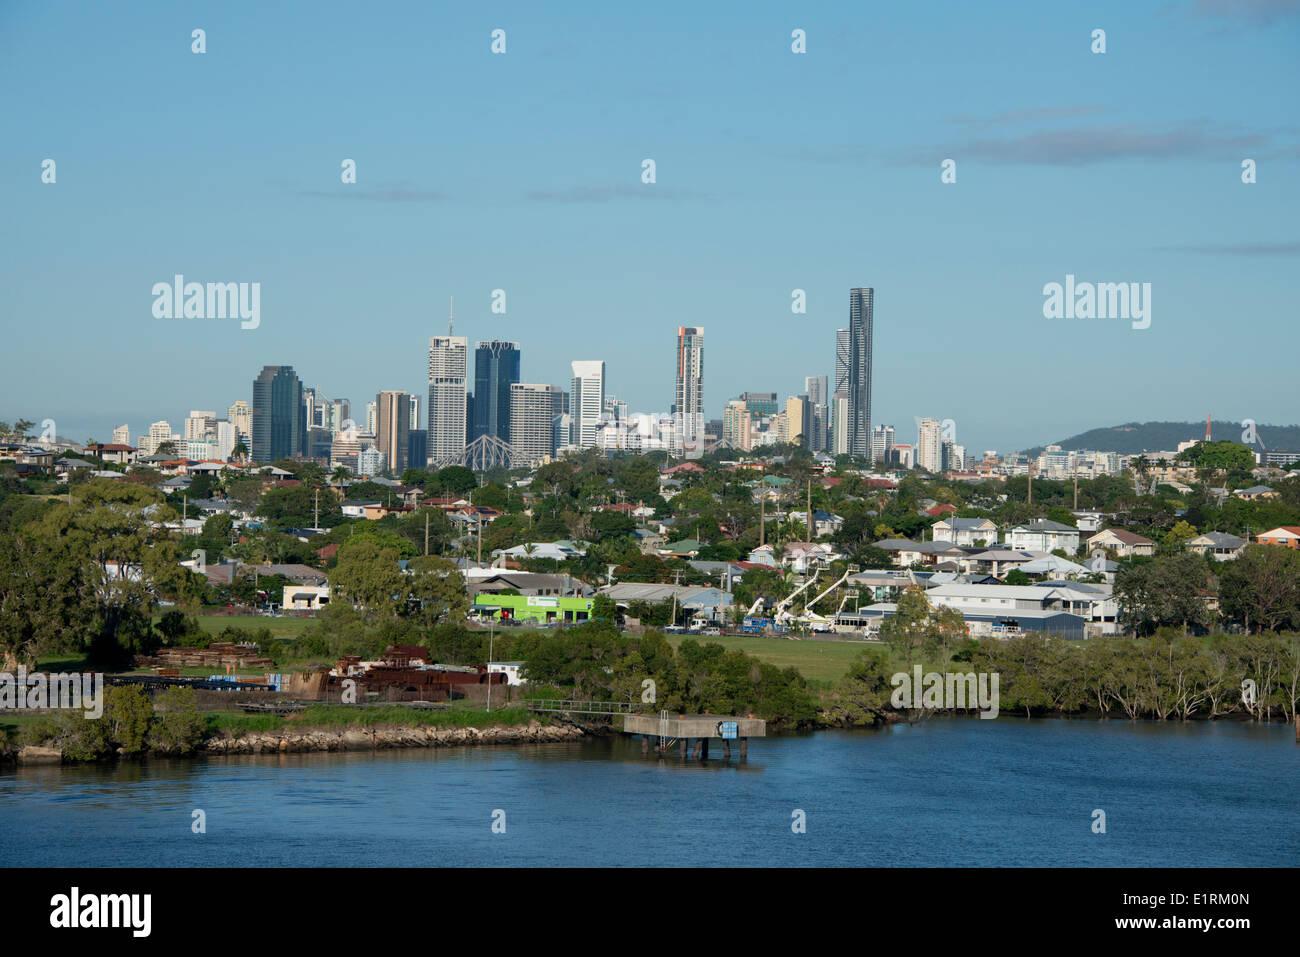 Australia, Queensland, capital city of Brisbane. Brisbane River view of downtown city skyline. - Stock Image